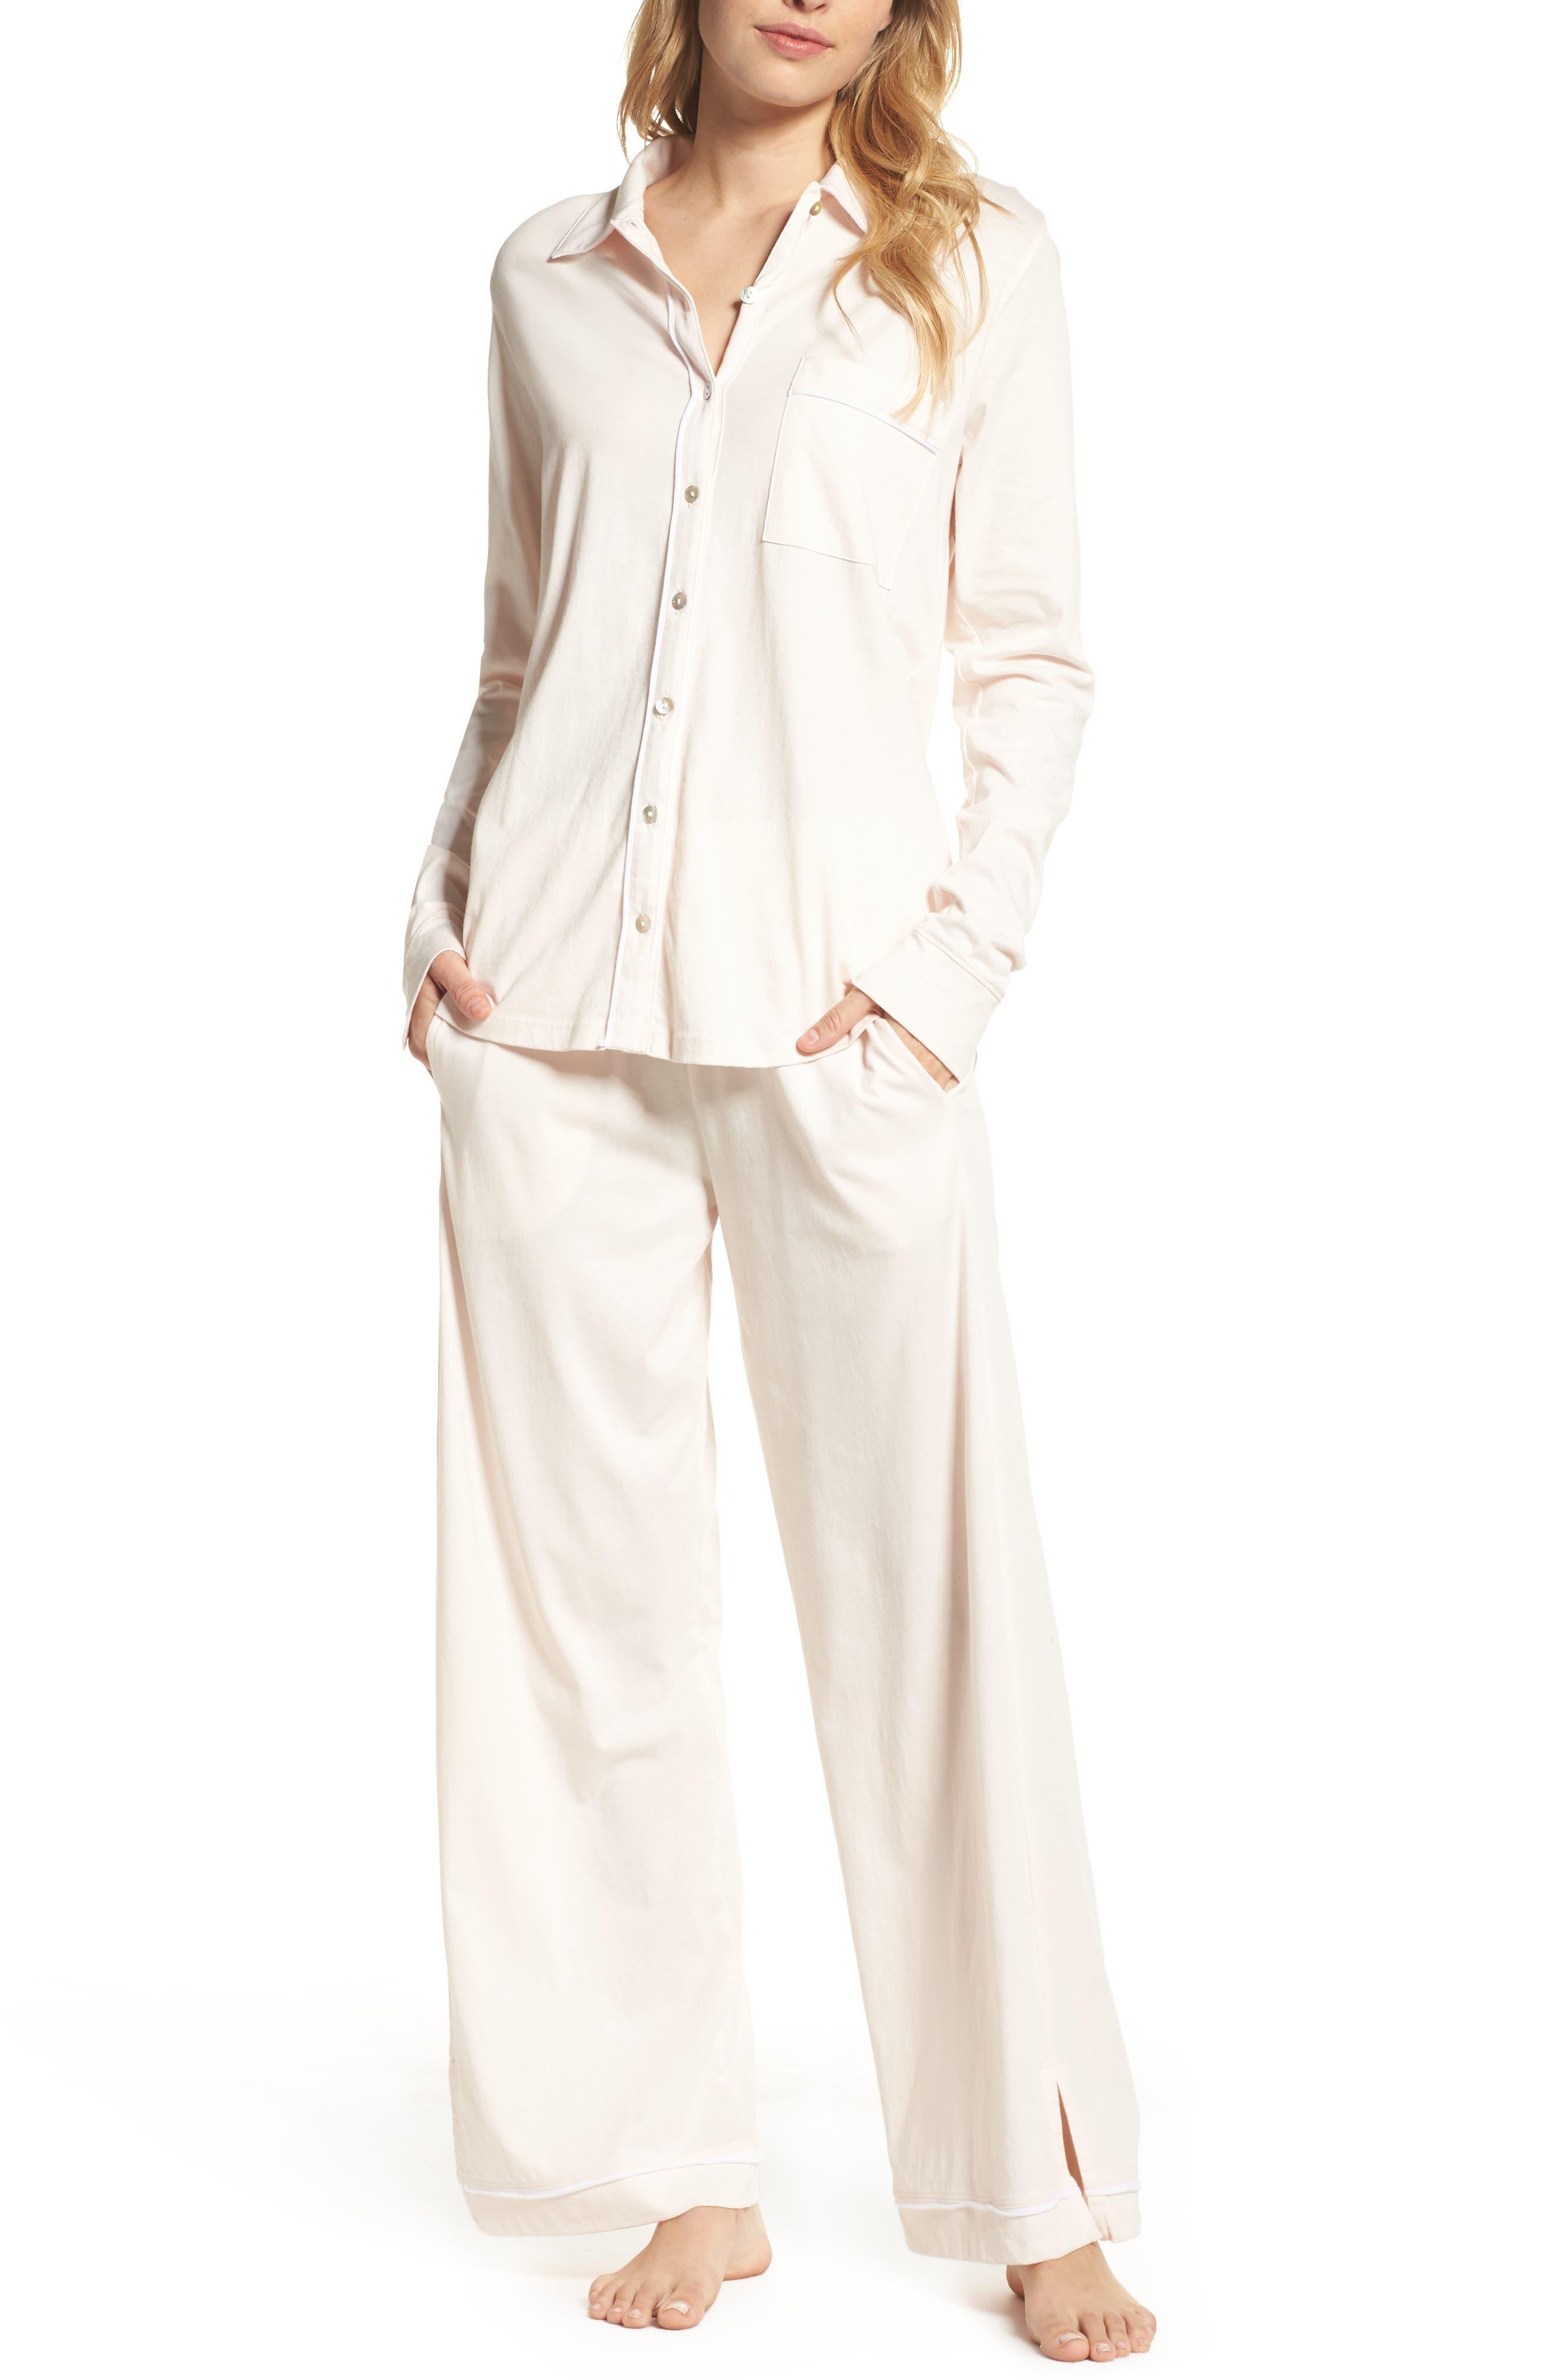 Penelope Pima Cotton Pajamas,                             Main thumbnail 1, color,                             689